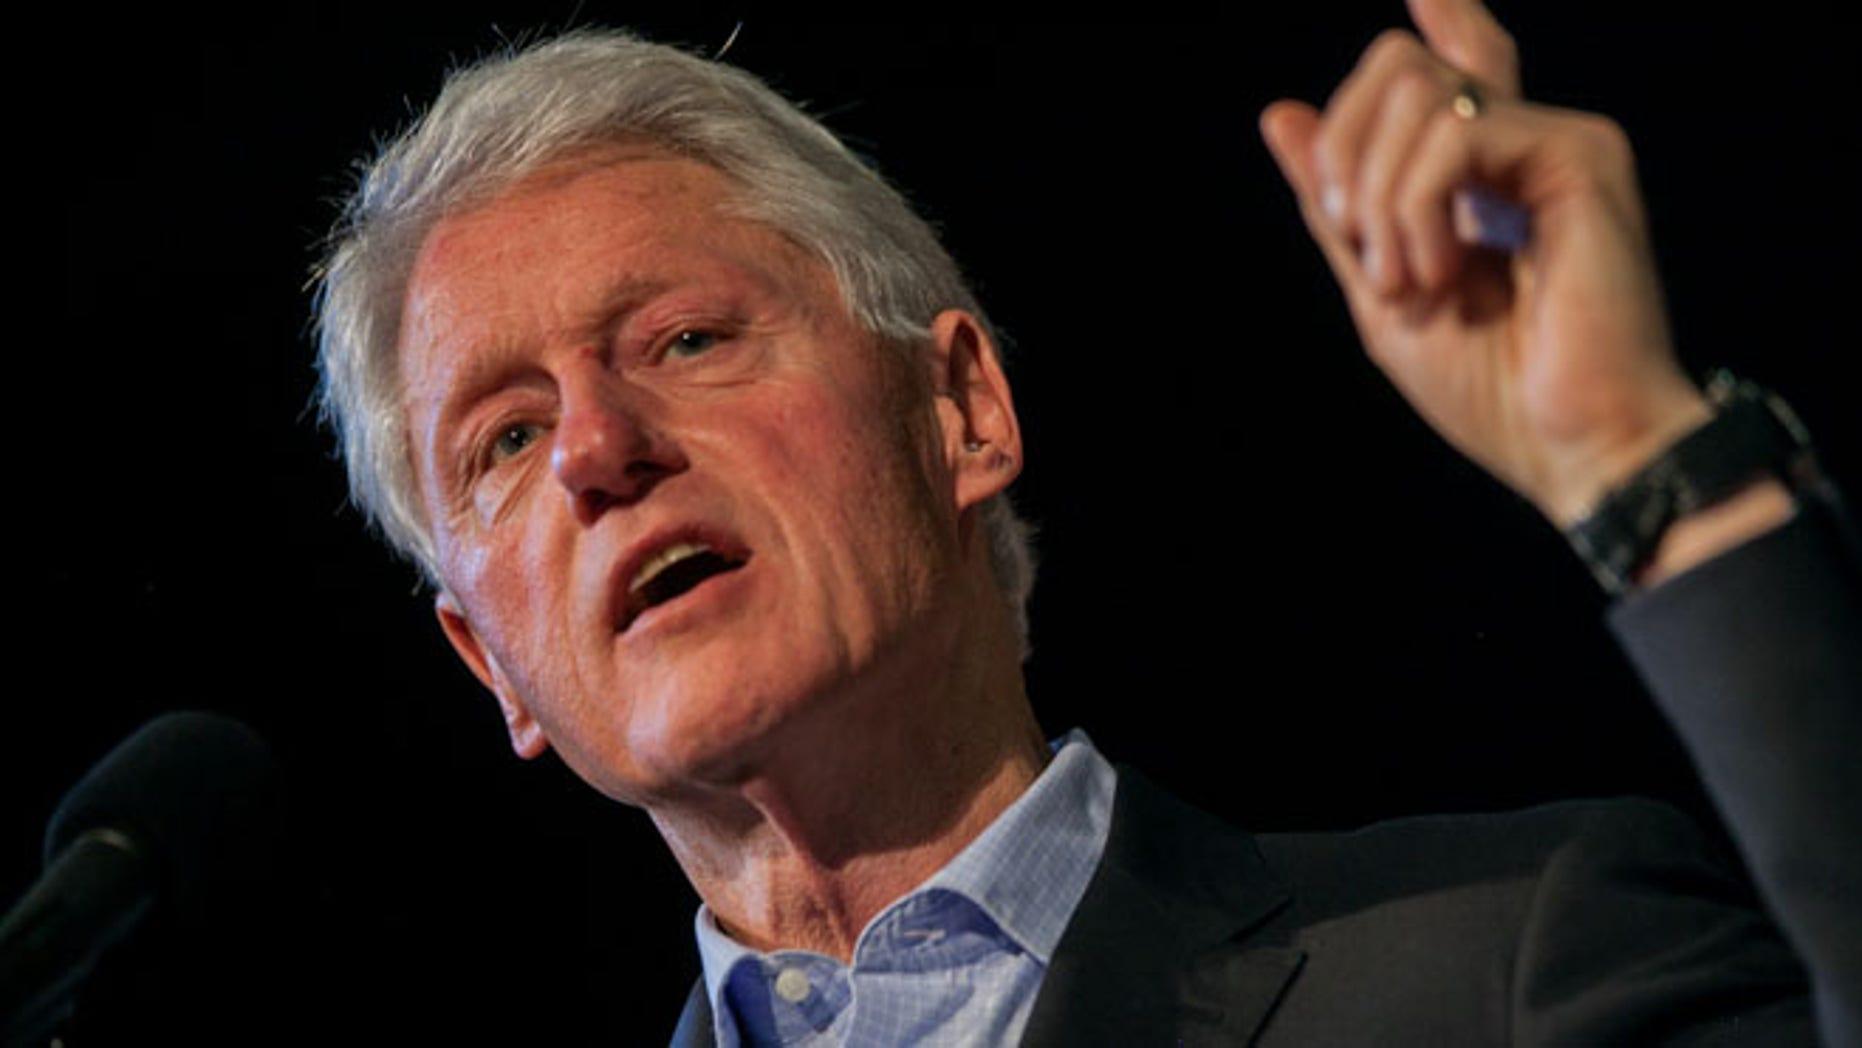 Former President Bill Clinton delivers a speech at Richmond Community High School in Richmond, Va. on Sunday, Oct. 27, 2013.